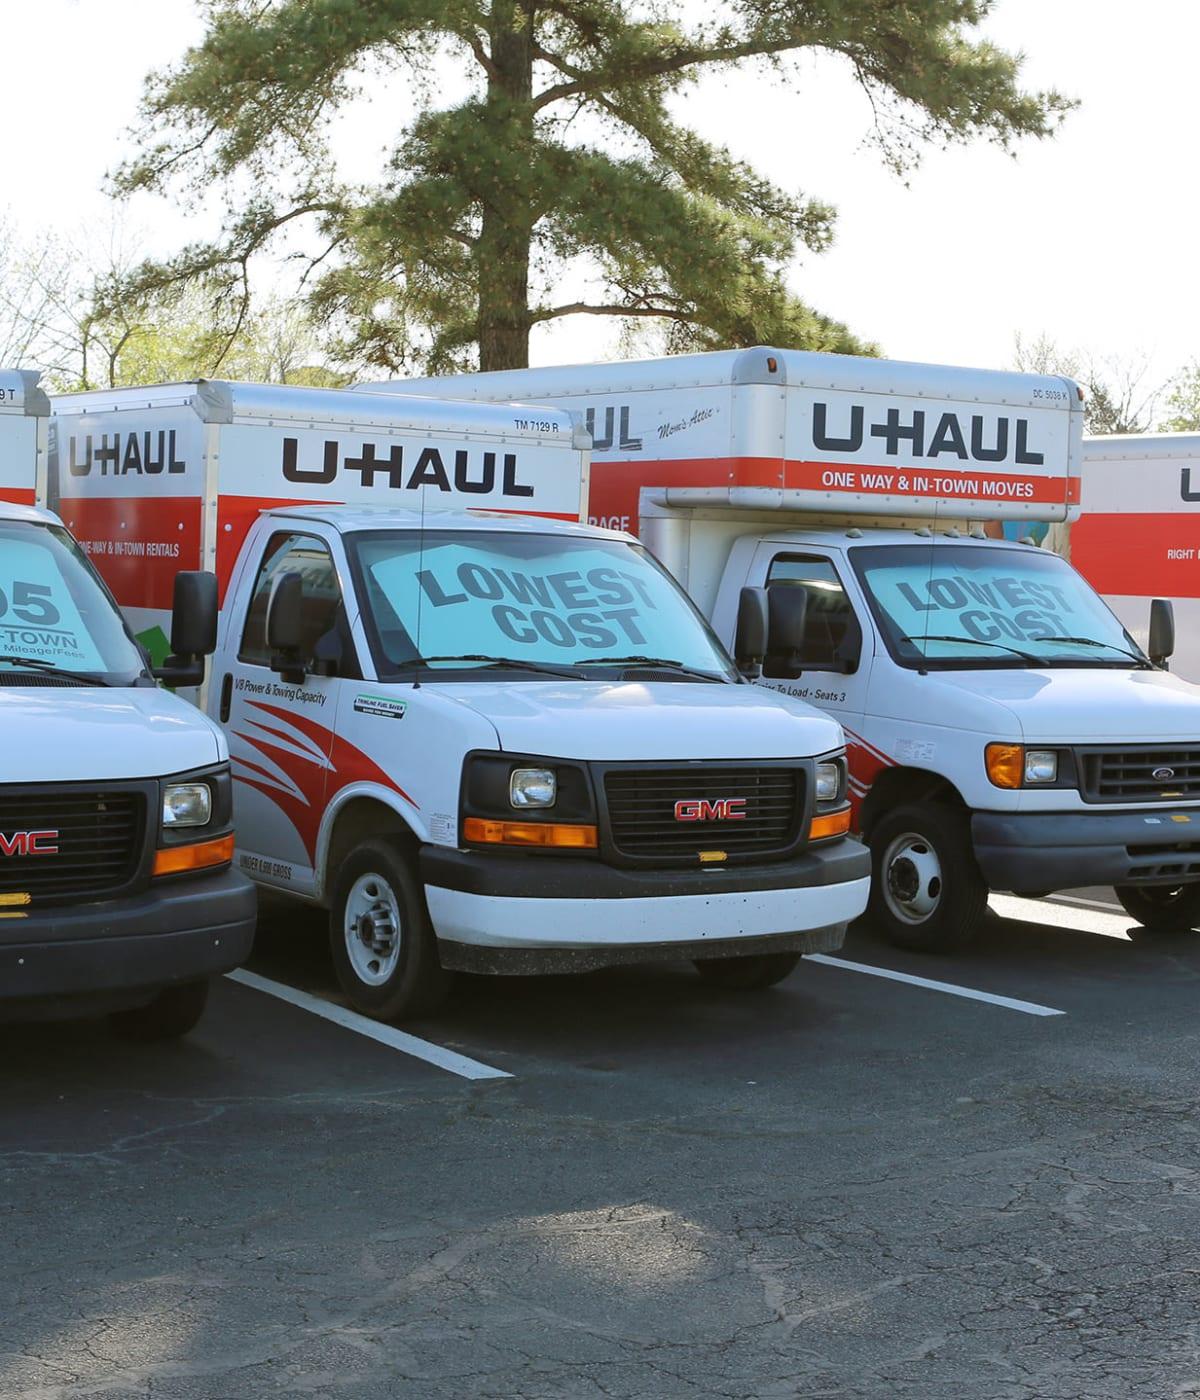 Midgard Self Storage in Midland, North Carolina, has moving trucks for rent